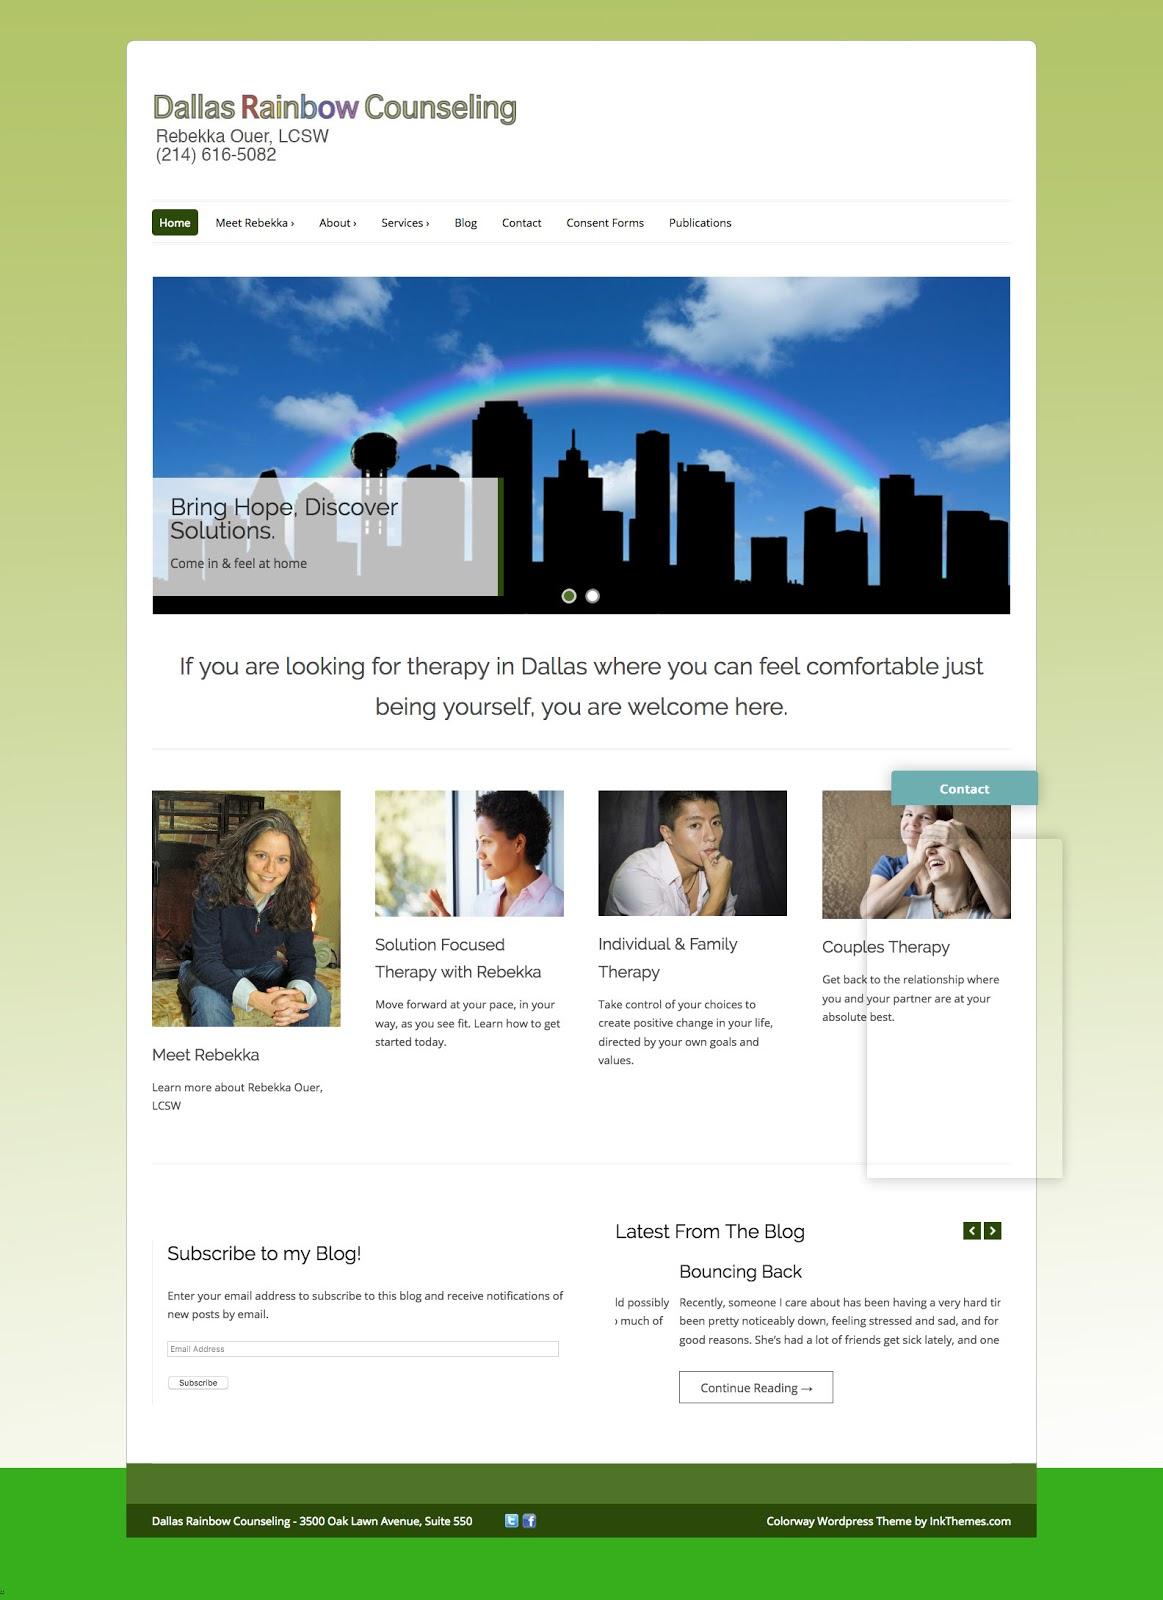 Dallas Rainbow Counseling